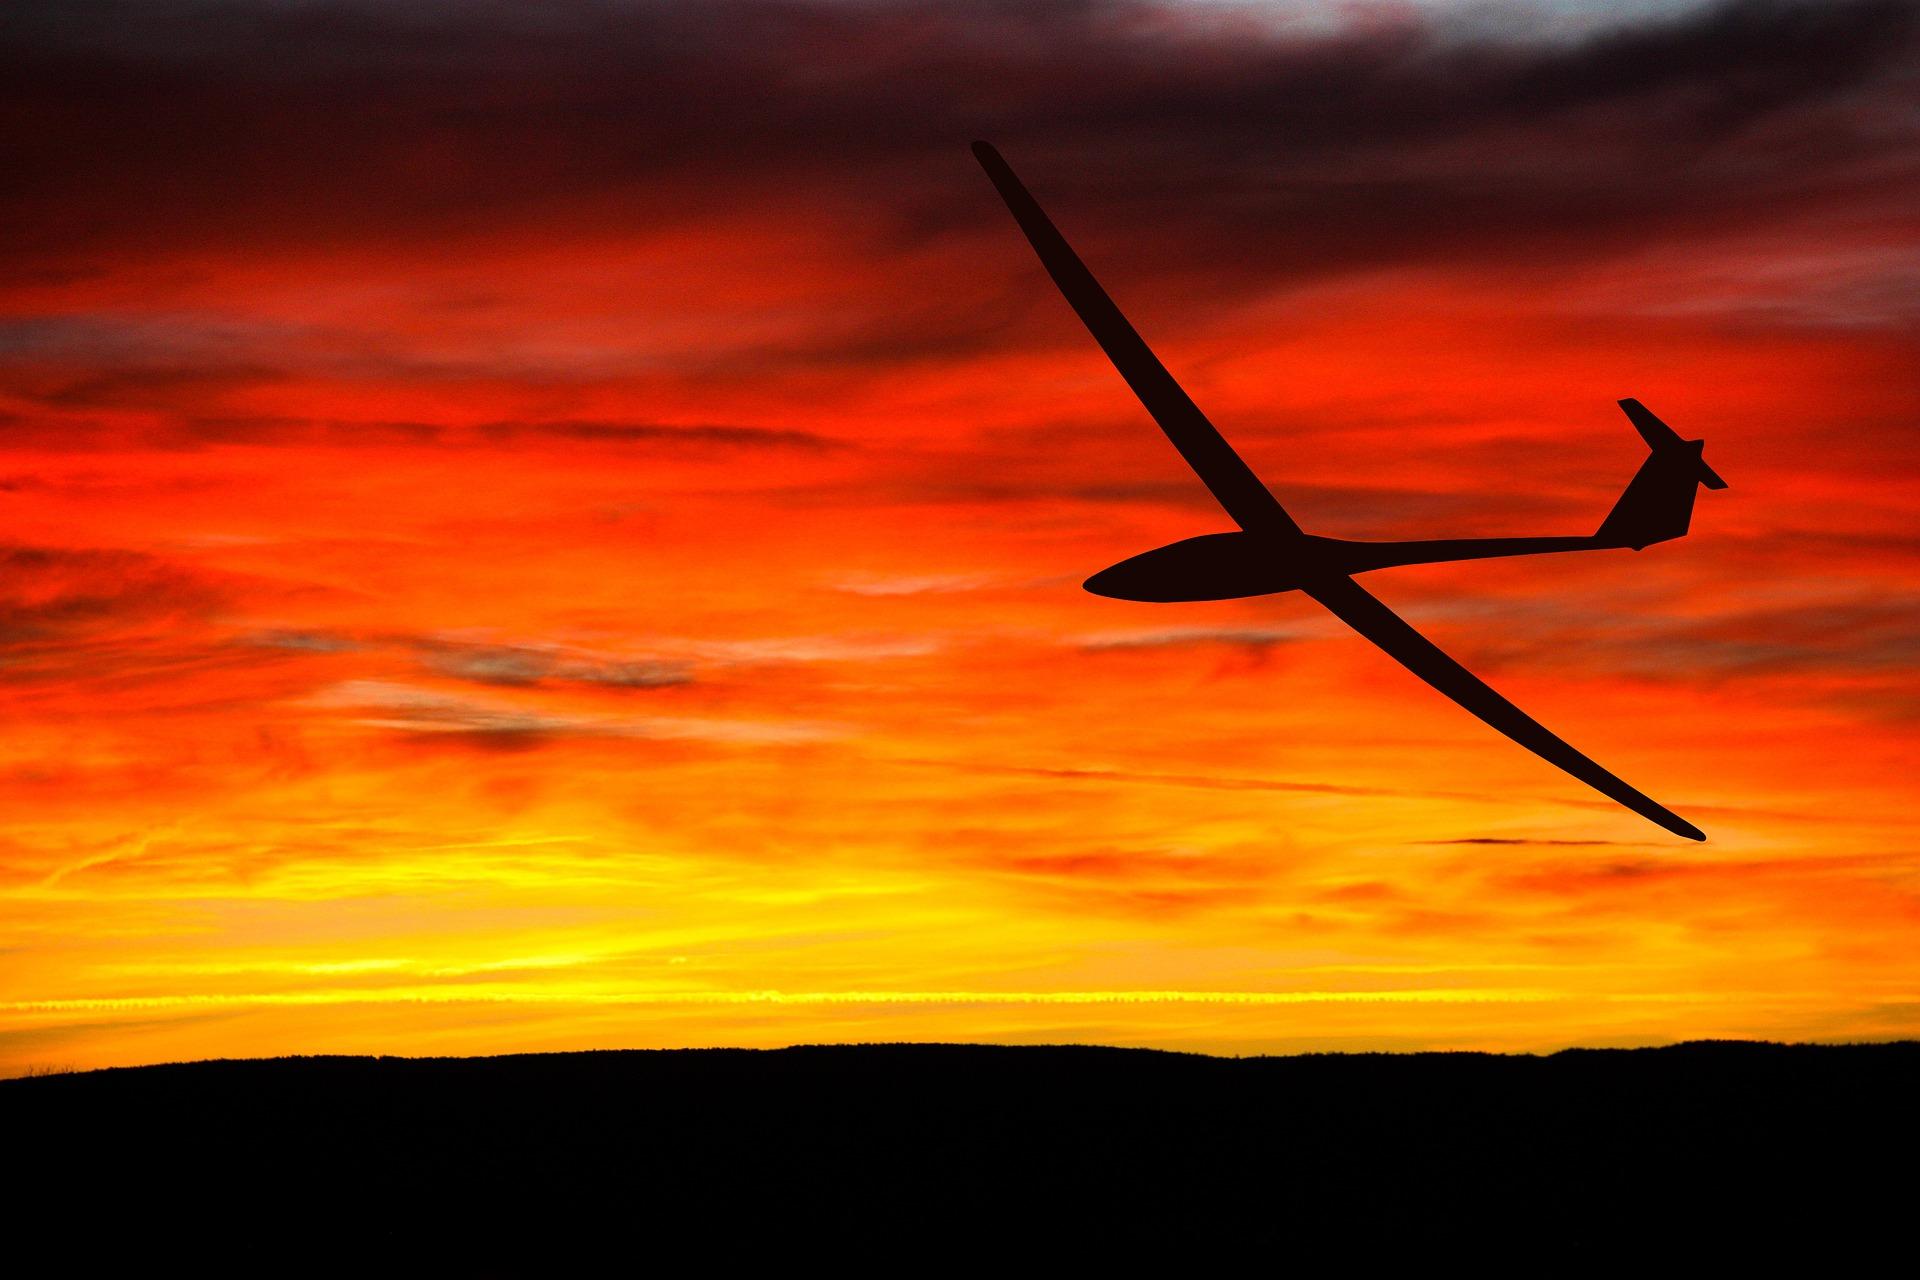 Lot nad chmurami  Sebastiana Kawy